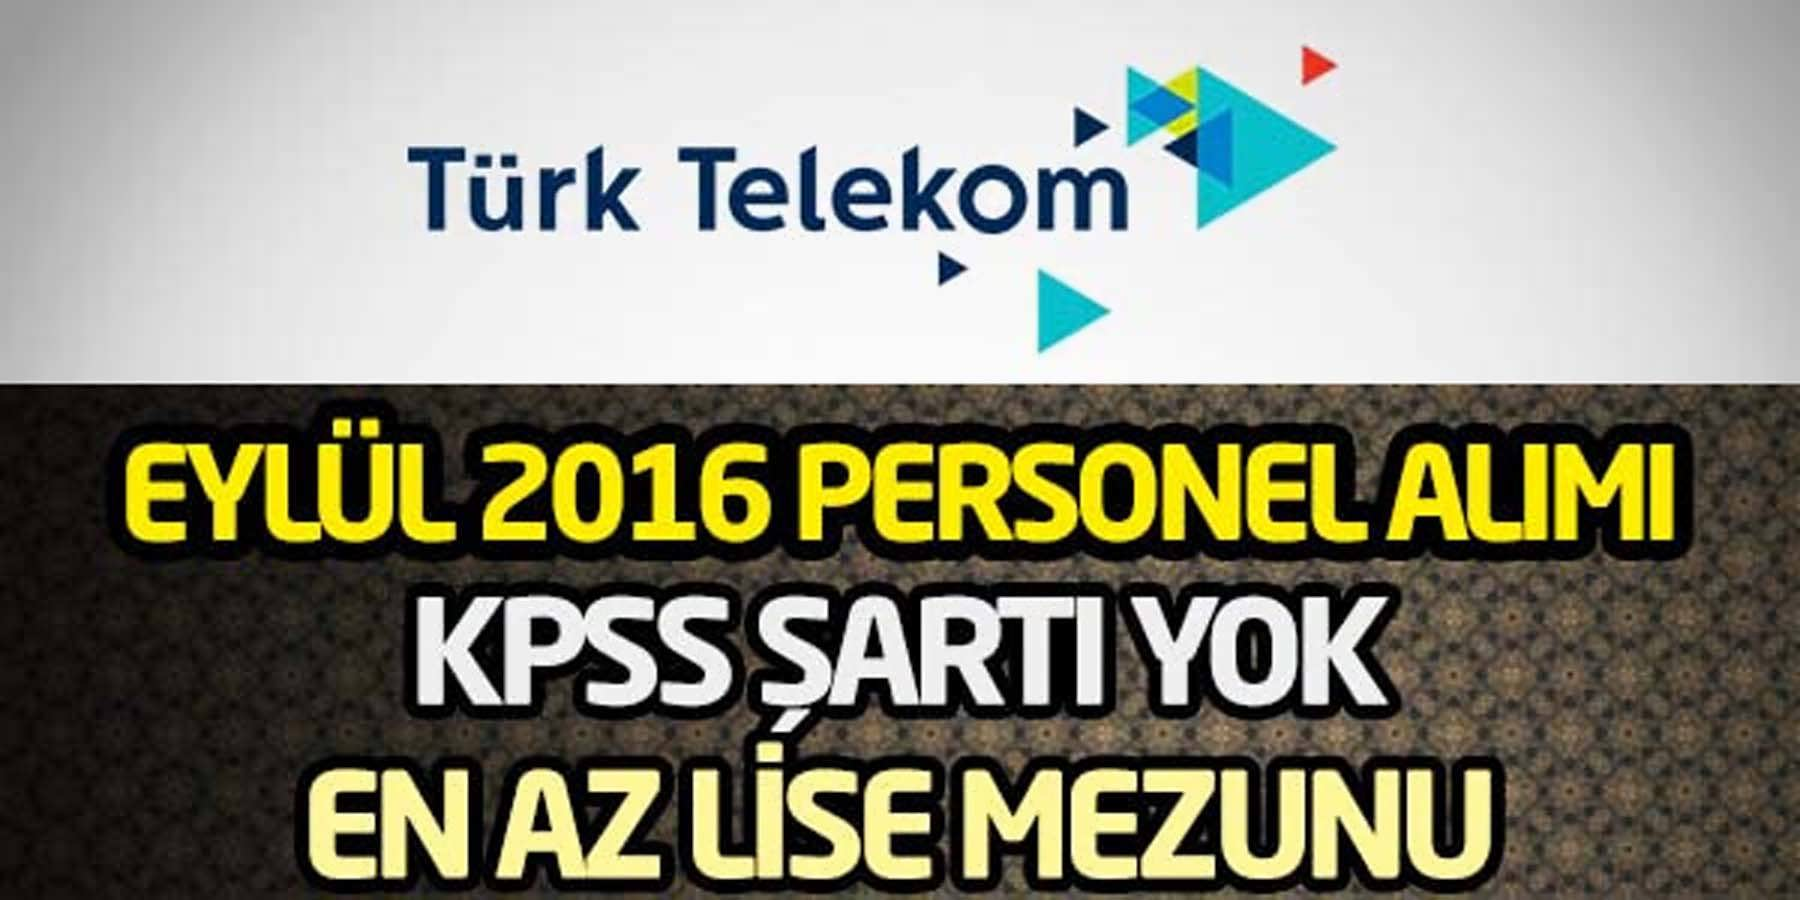 Türk Telekom Eylül 2016 Personel Alımı